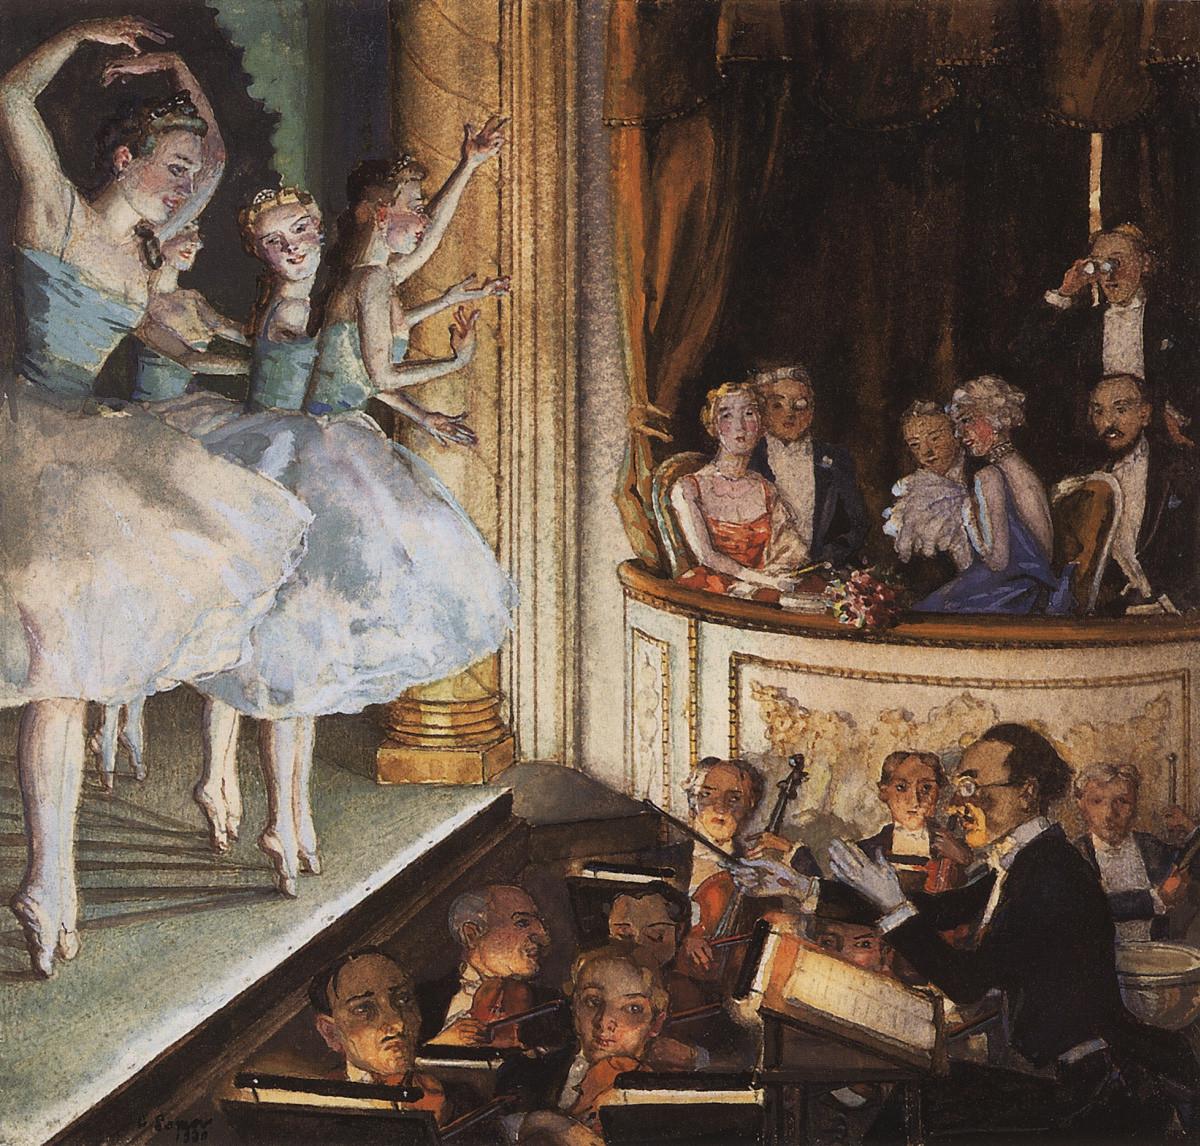 Konstantin Somov. Ballet russe, 1930